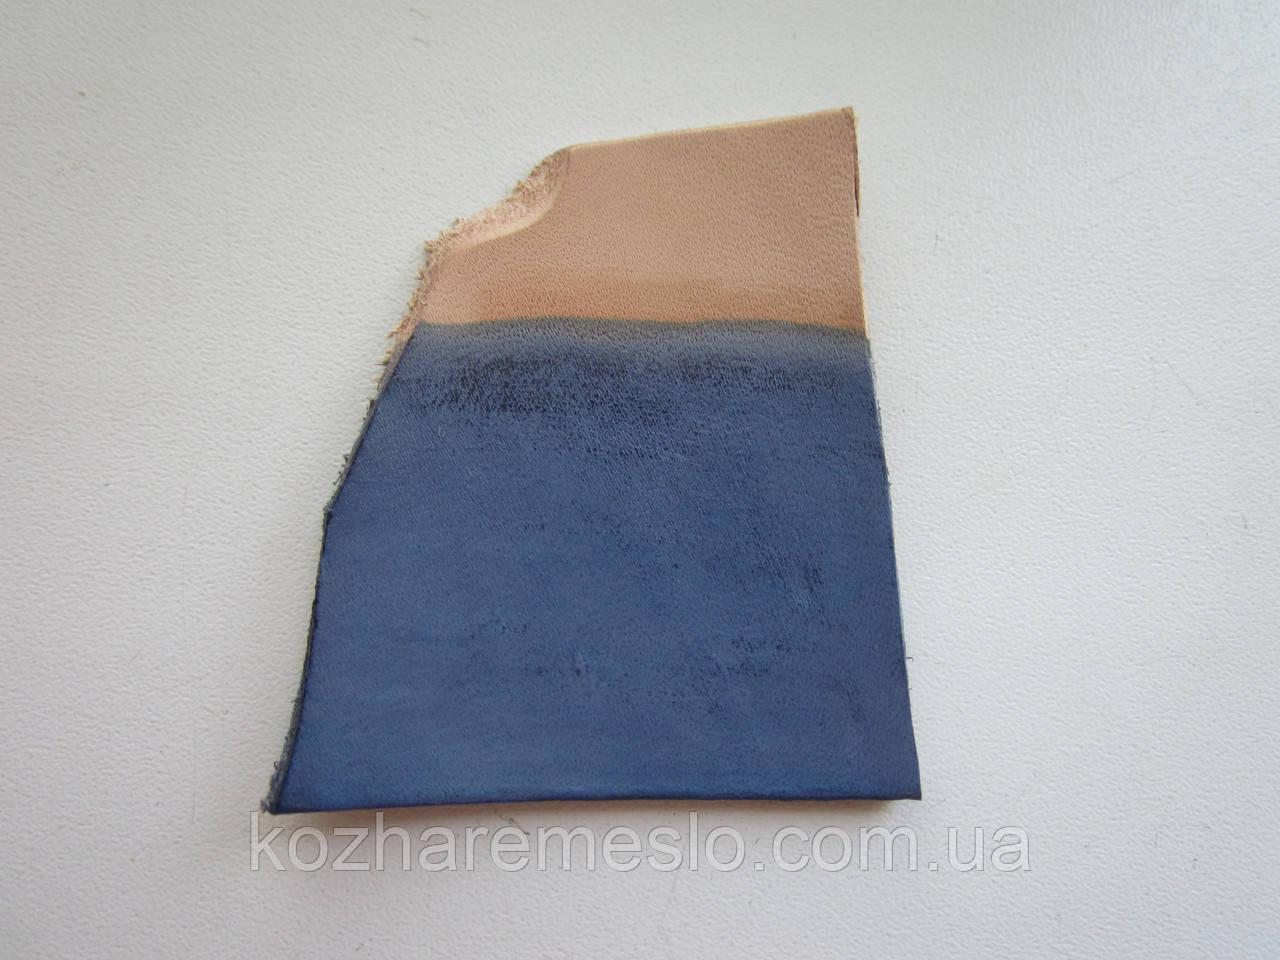 Краска для кожи WATERSTAIN Fenice на водной основе 100 мл синяя (Италия)